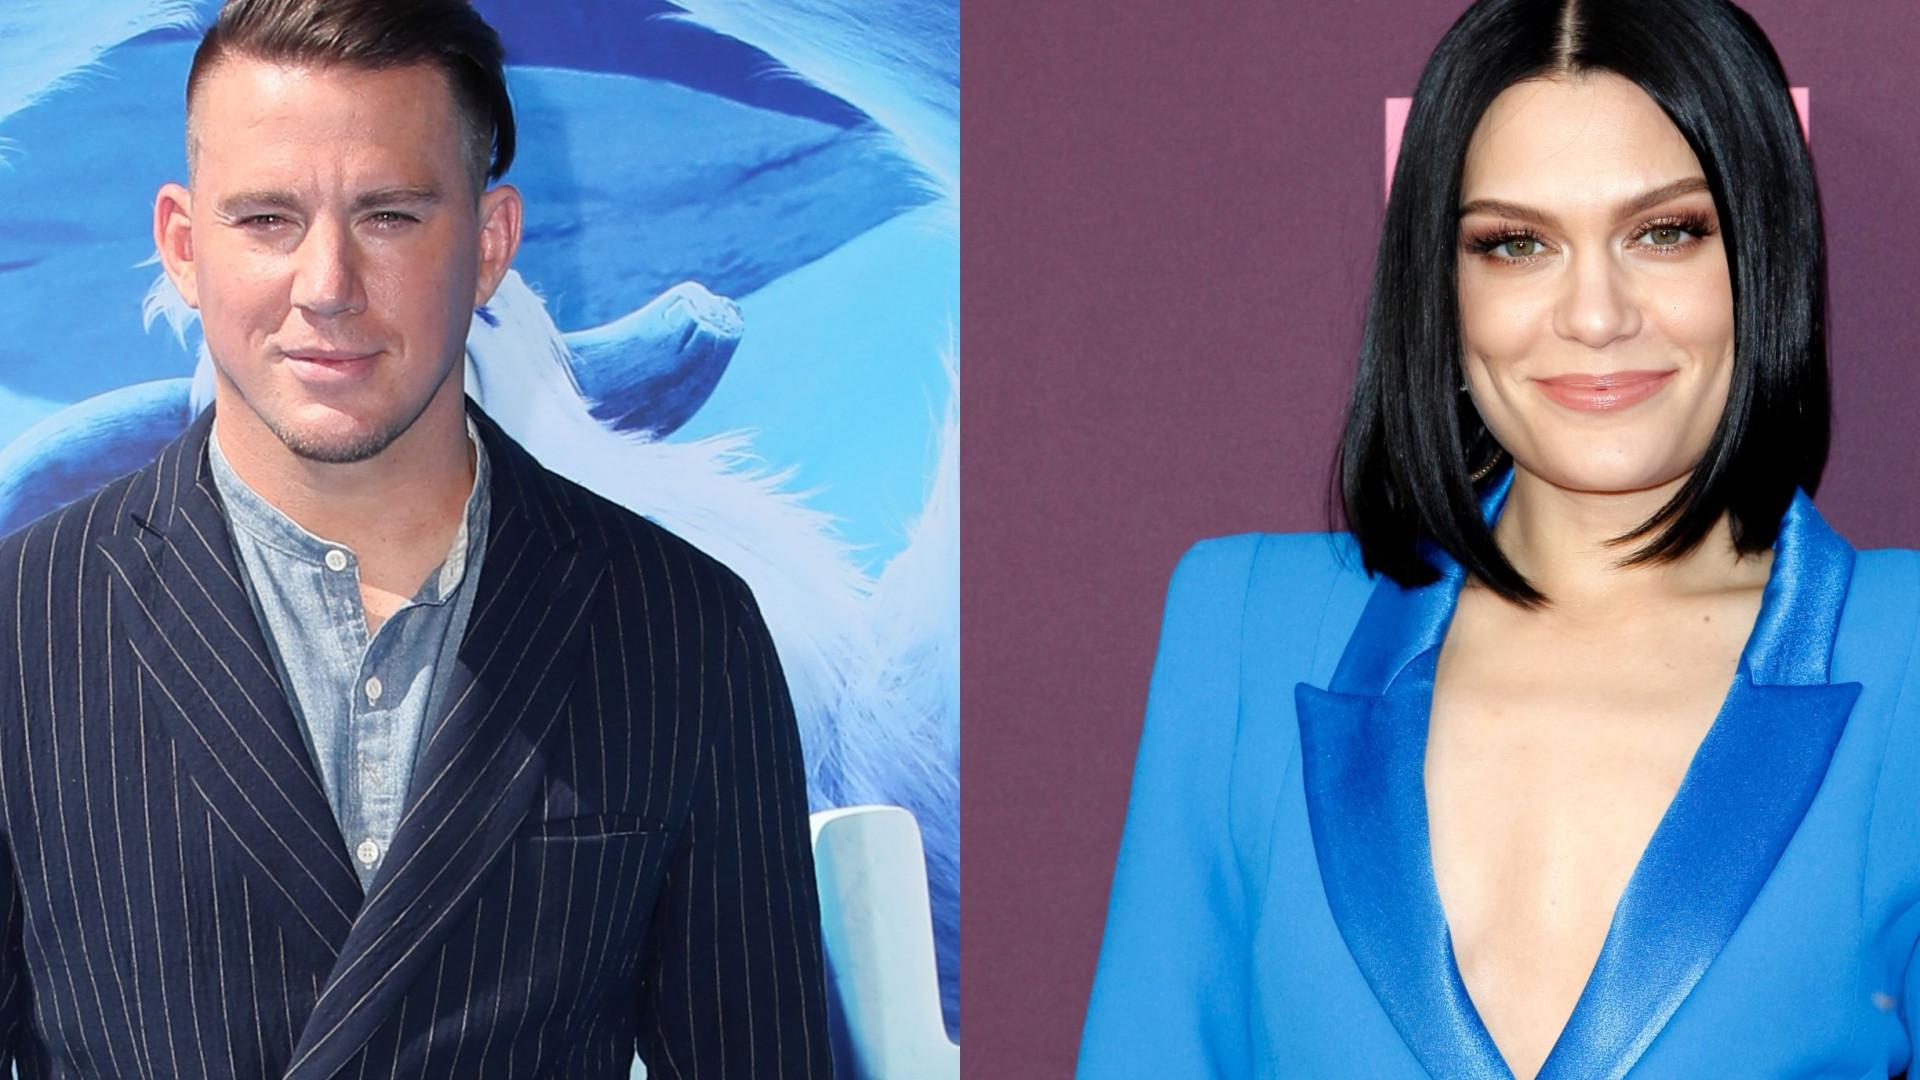 Jessie J pode ter confirmado romance com Channing Tatum